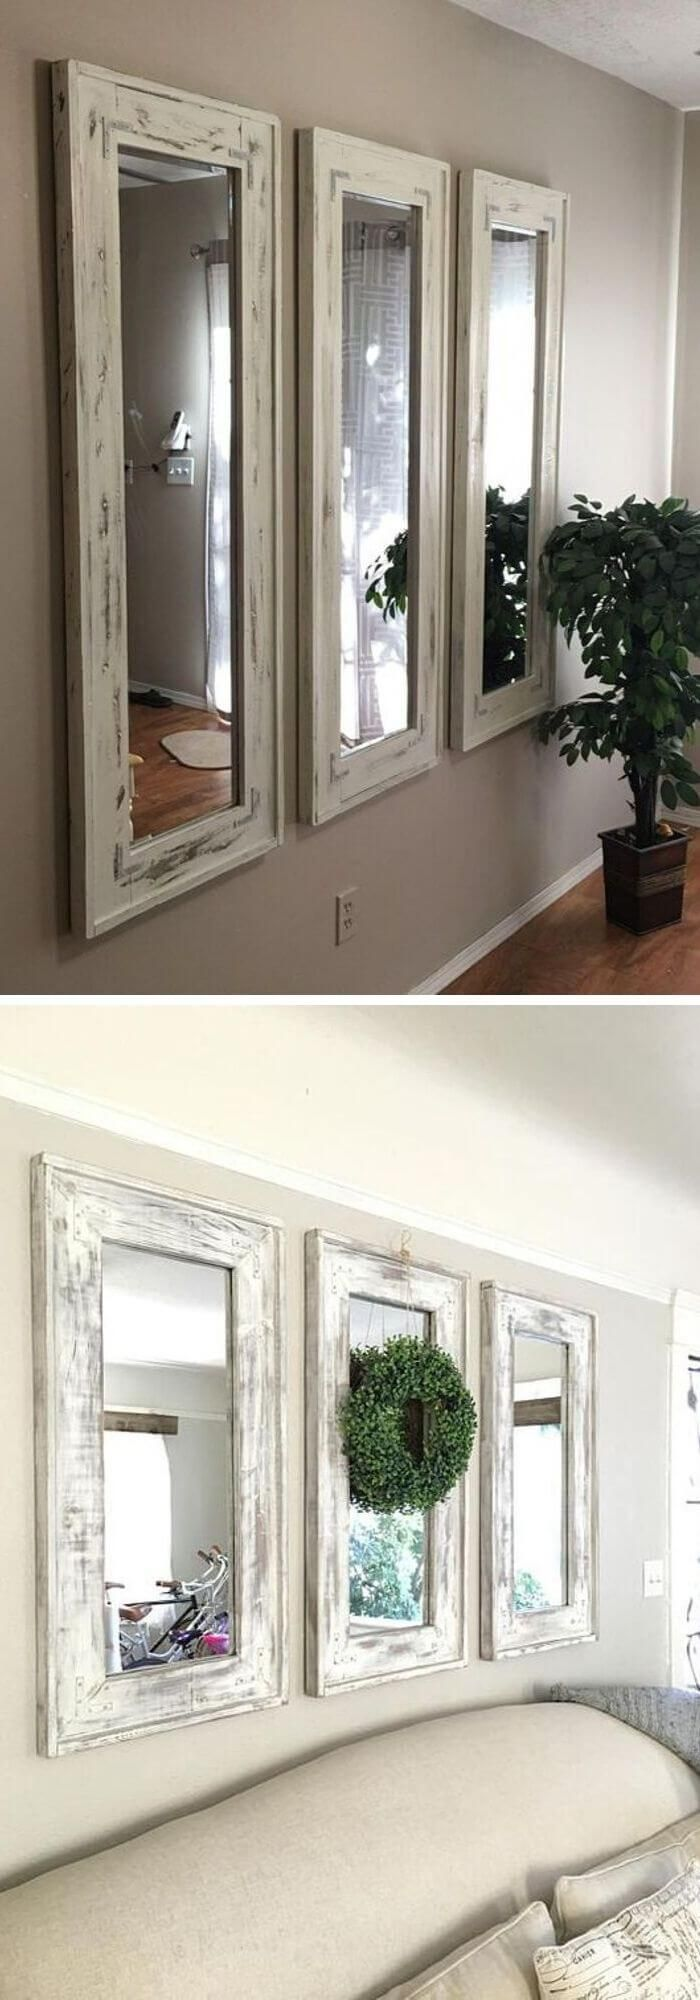 22+ Beautiful Farmhouse Mirror Decor Ideas & Designs For ...